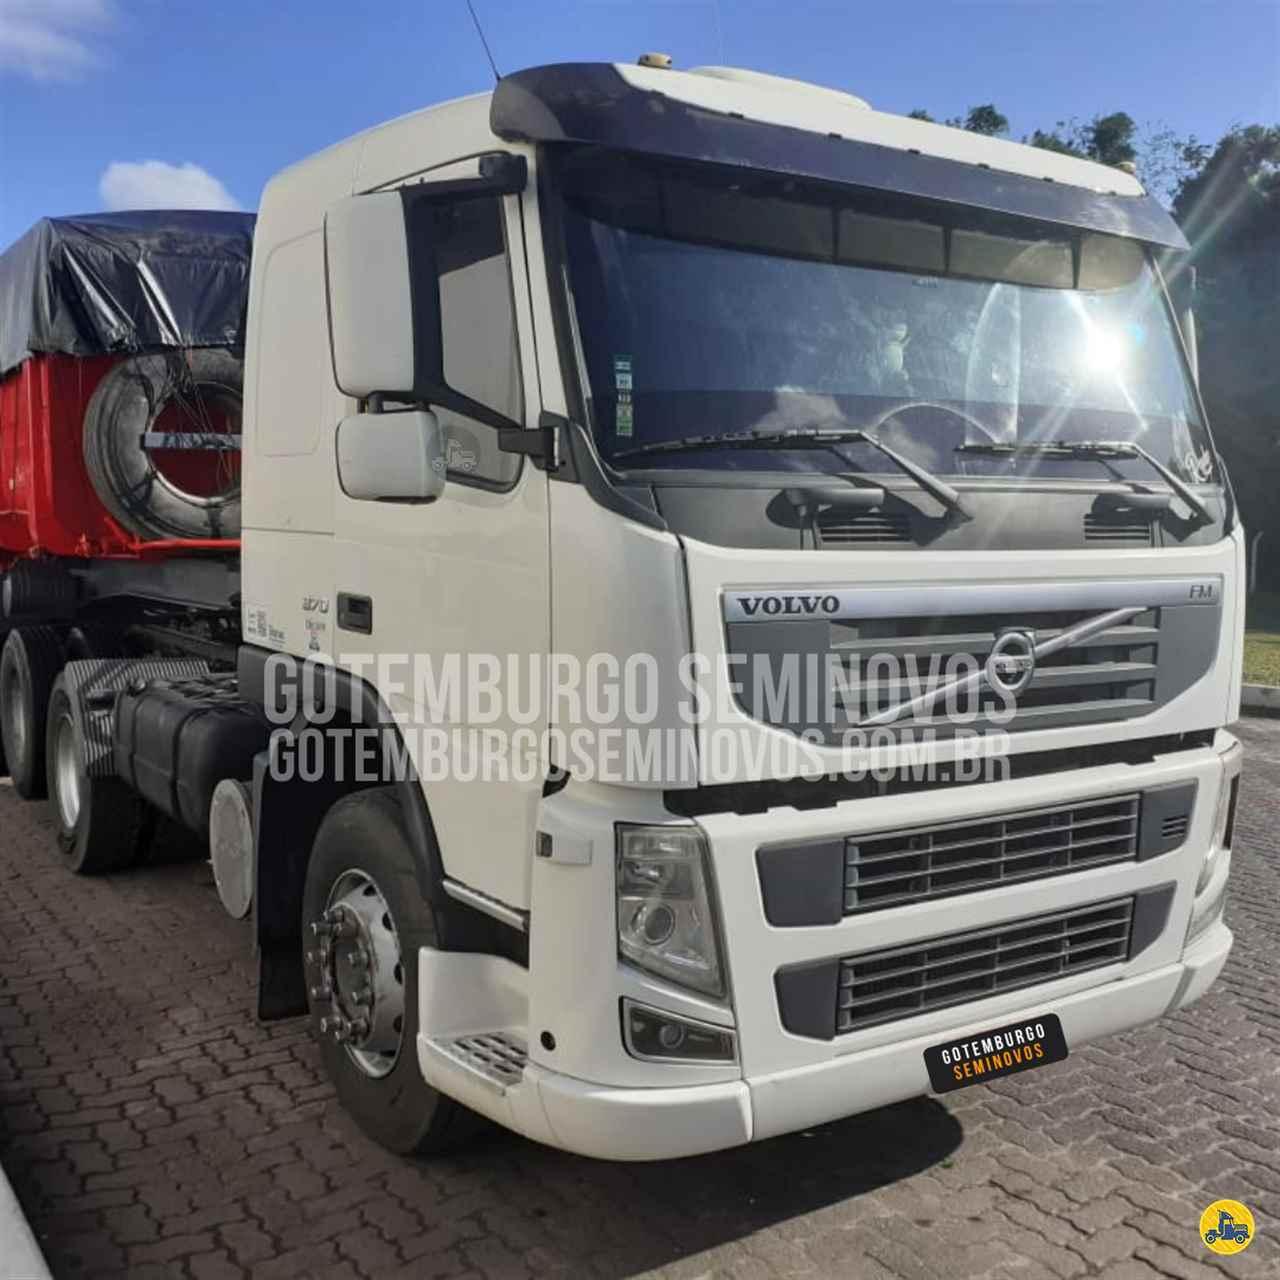 CAMINHAO VOLVO VOLVO FM 370 Cavalo Mecânico Truck 6x2 Gotemburgo - VOLVO no Nordeste SIMOES FILHO BAHIA BA